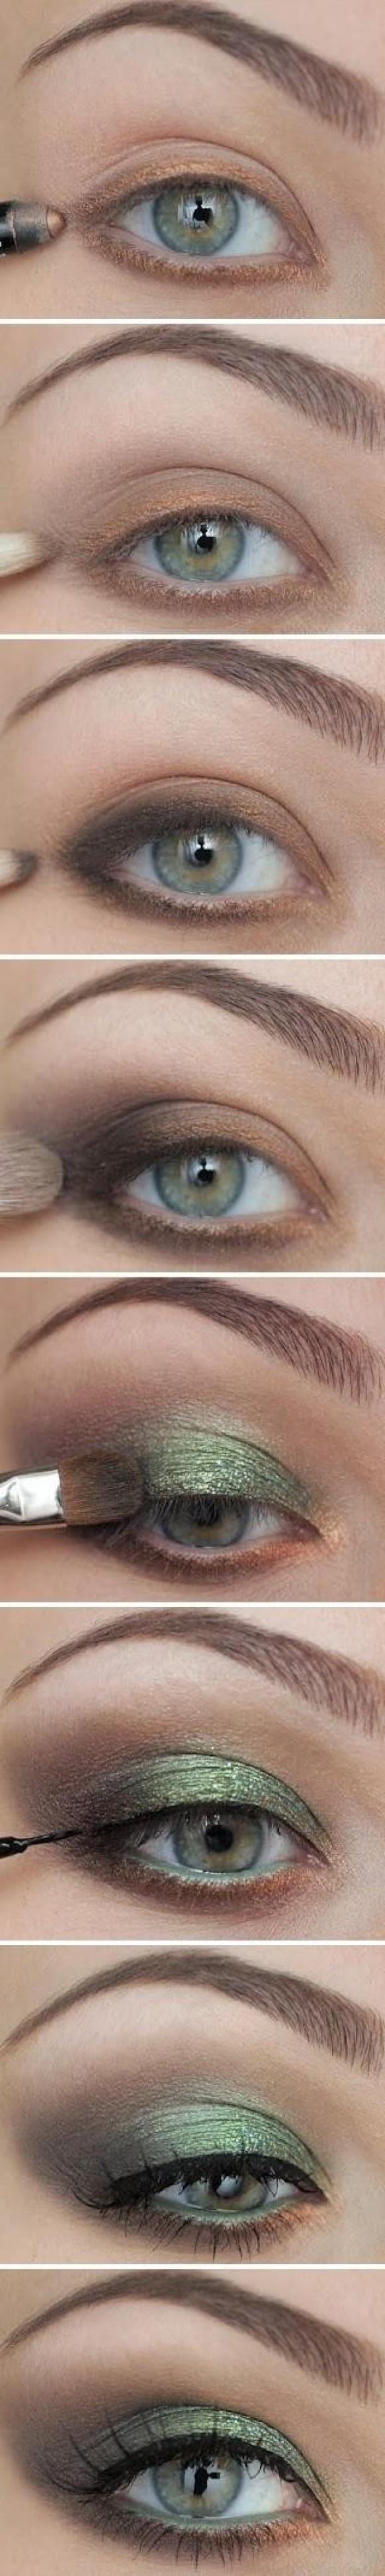 www.weddbook.com everything about wedding ♥ Best Bridal Makeup ♥ Green Smokey Eye Makeup #weddbookn#wedding #makeup #green